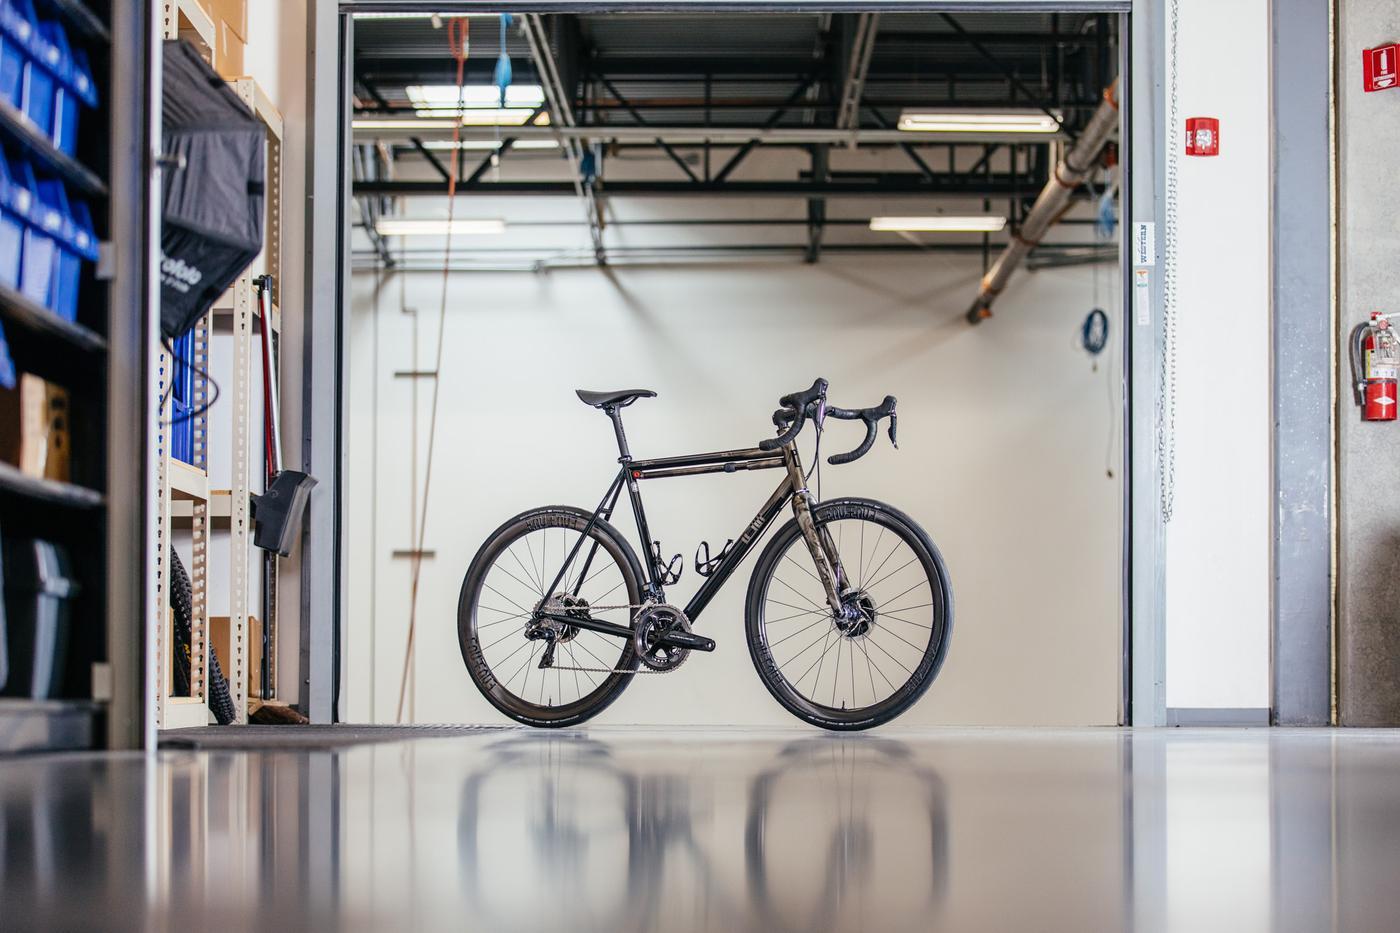 The Beautiful Bicycles of the ENVE Open House Part 01: Prova, Holland, Alchemy, Salt Air, Mosaic, Pursuit, English, Speedvagen, Bingham, Allied